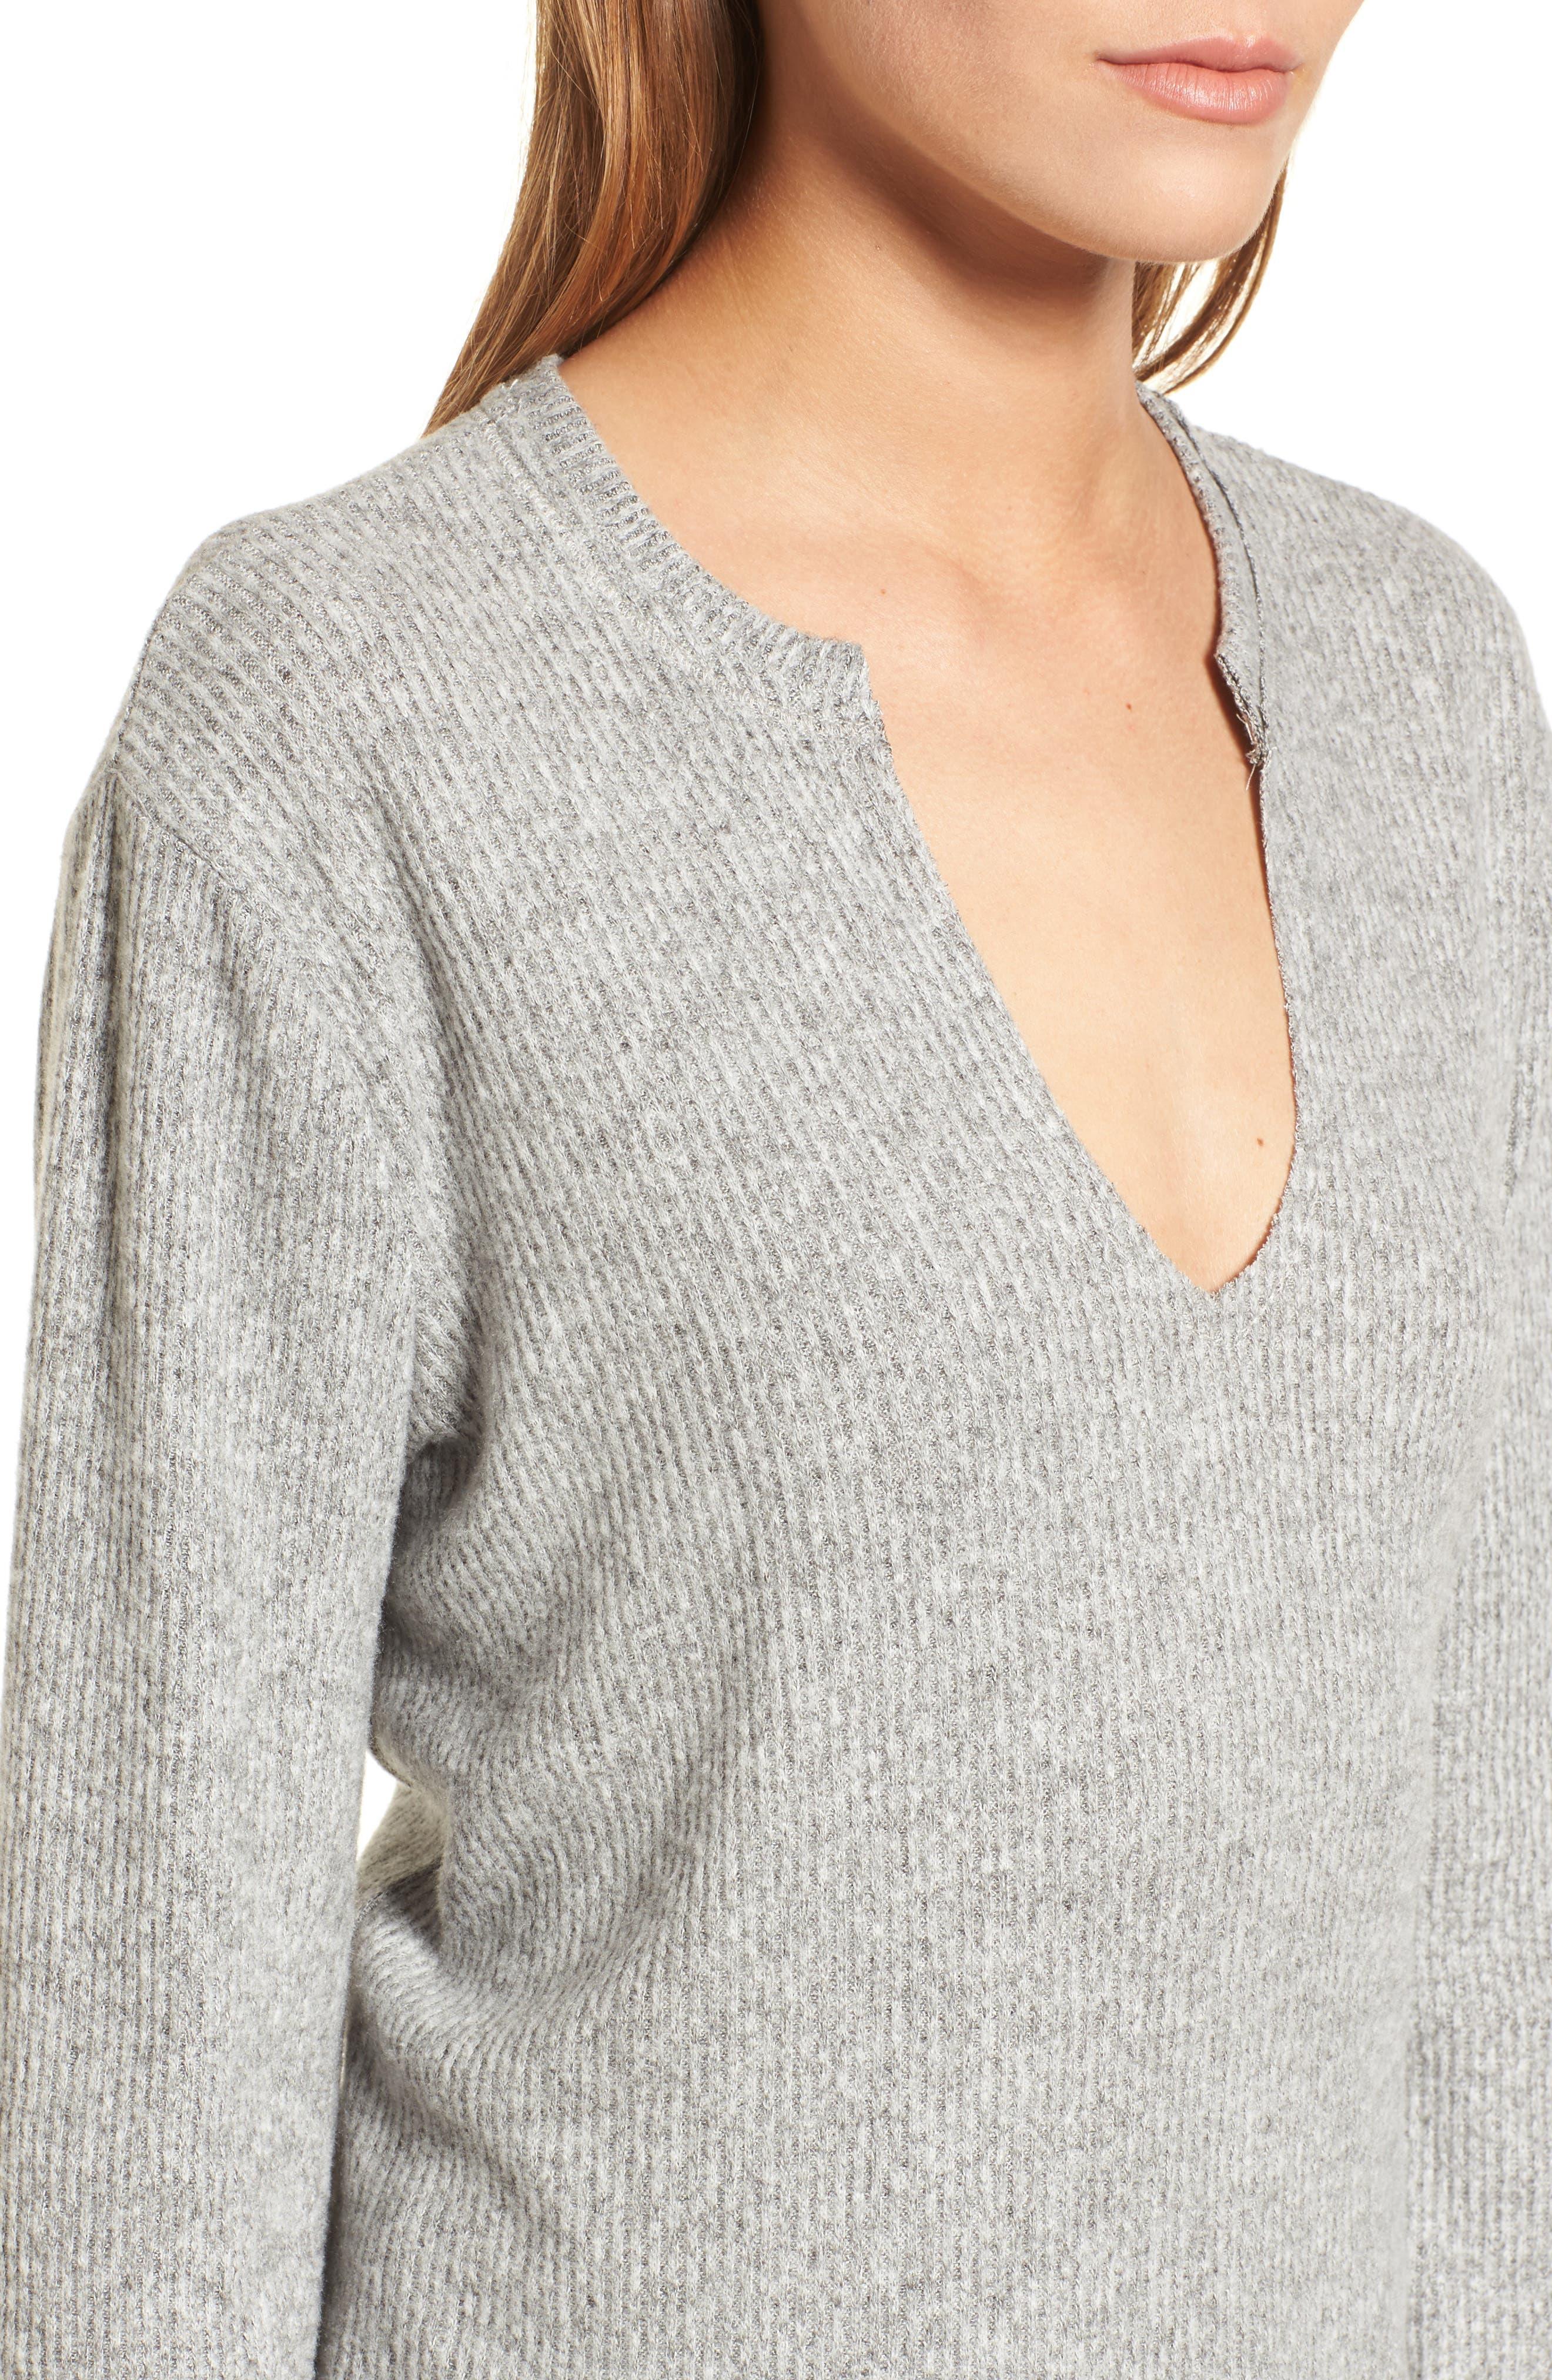 Ribbed Split Neck Sweater,                             Alternate thumbnail 4, color,                             020